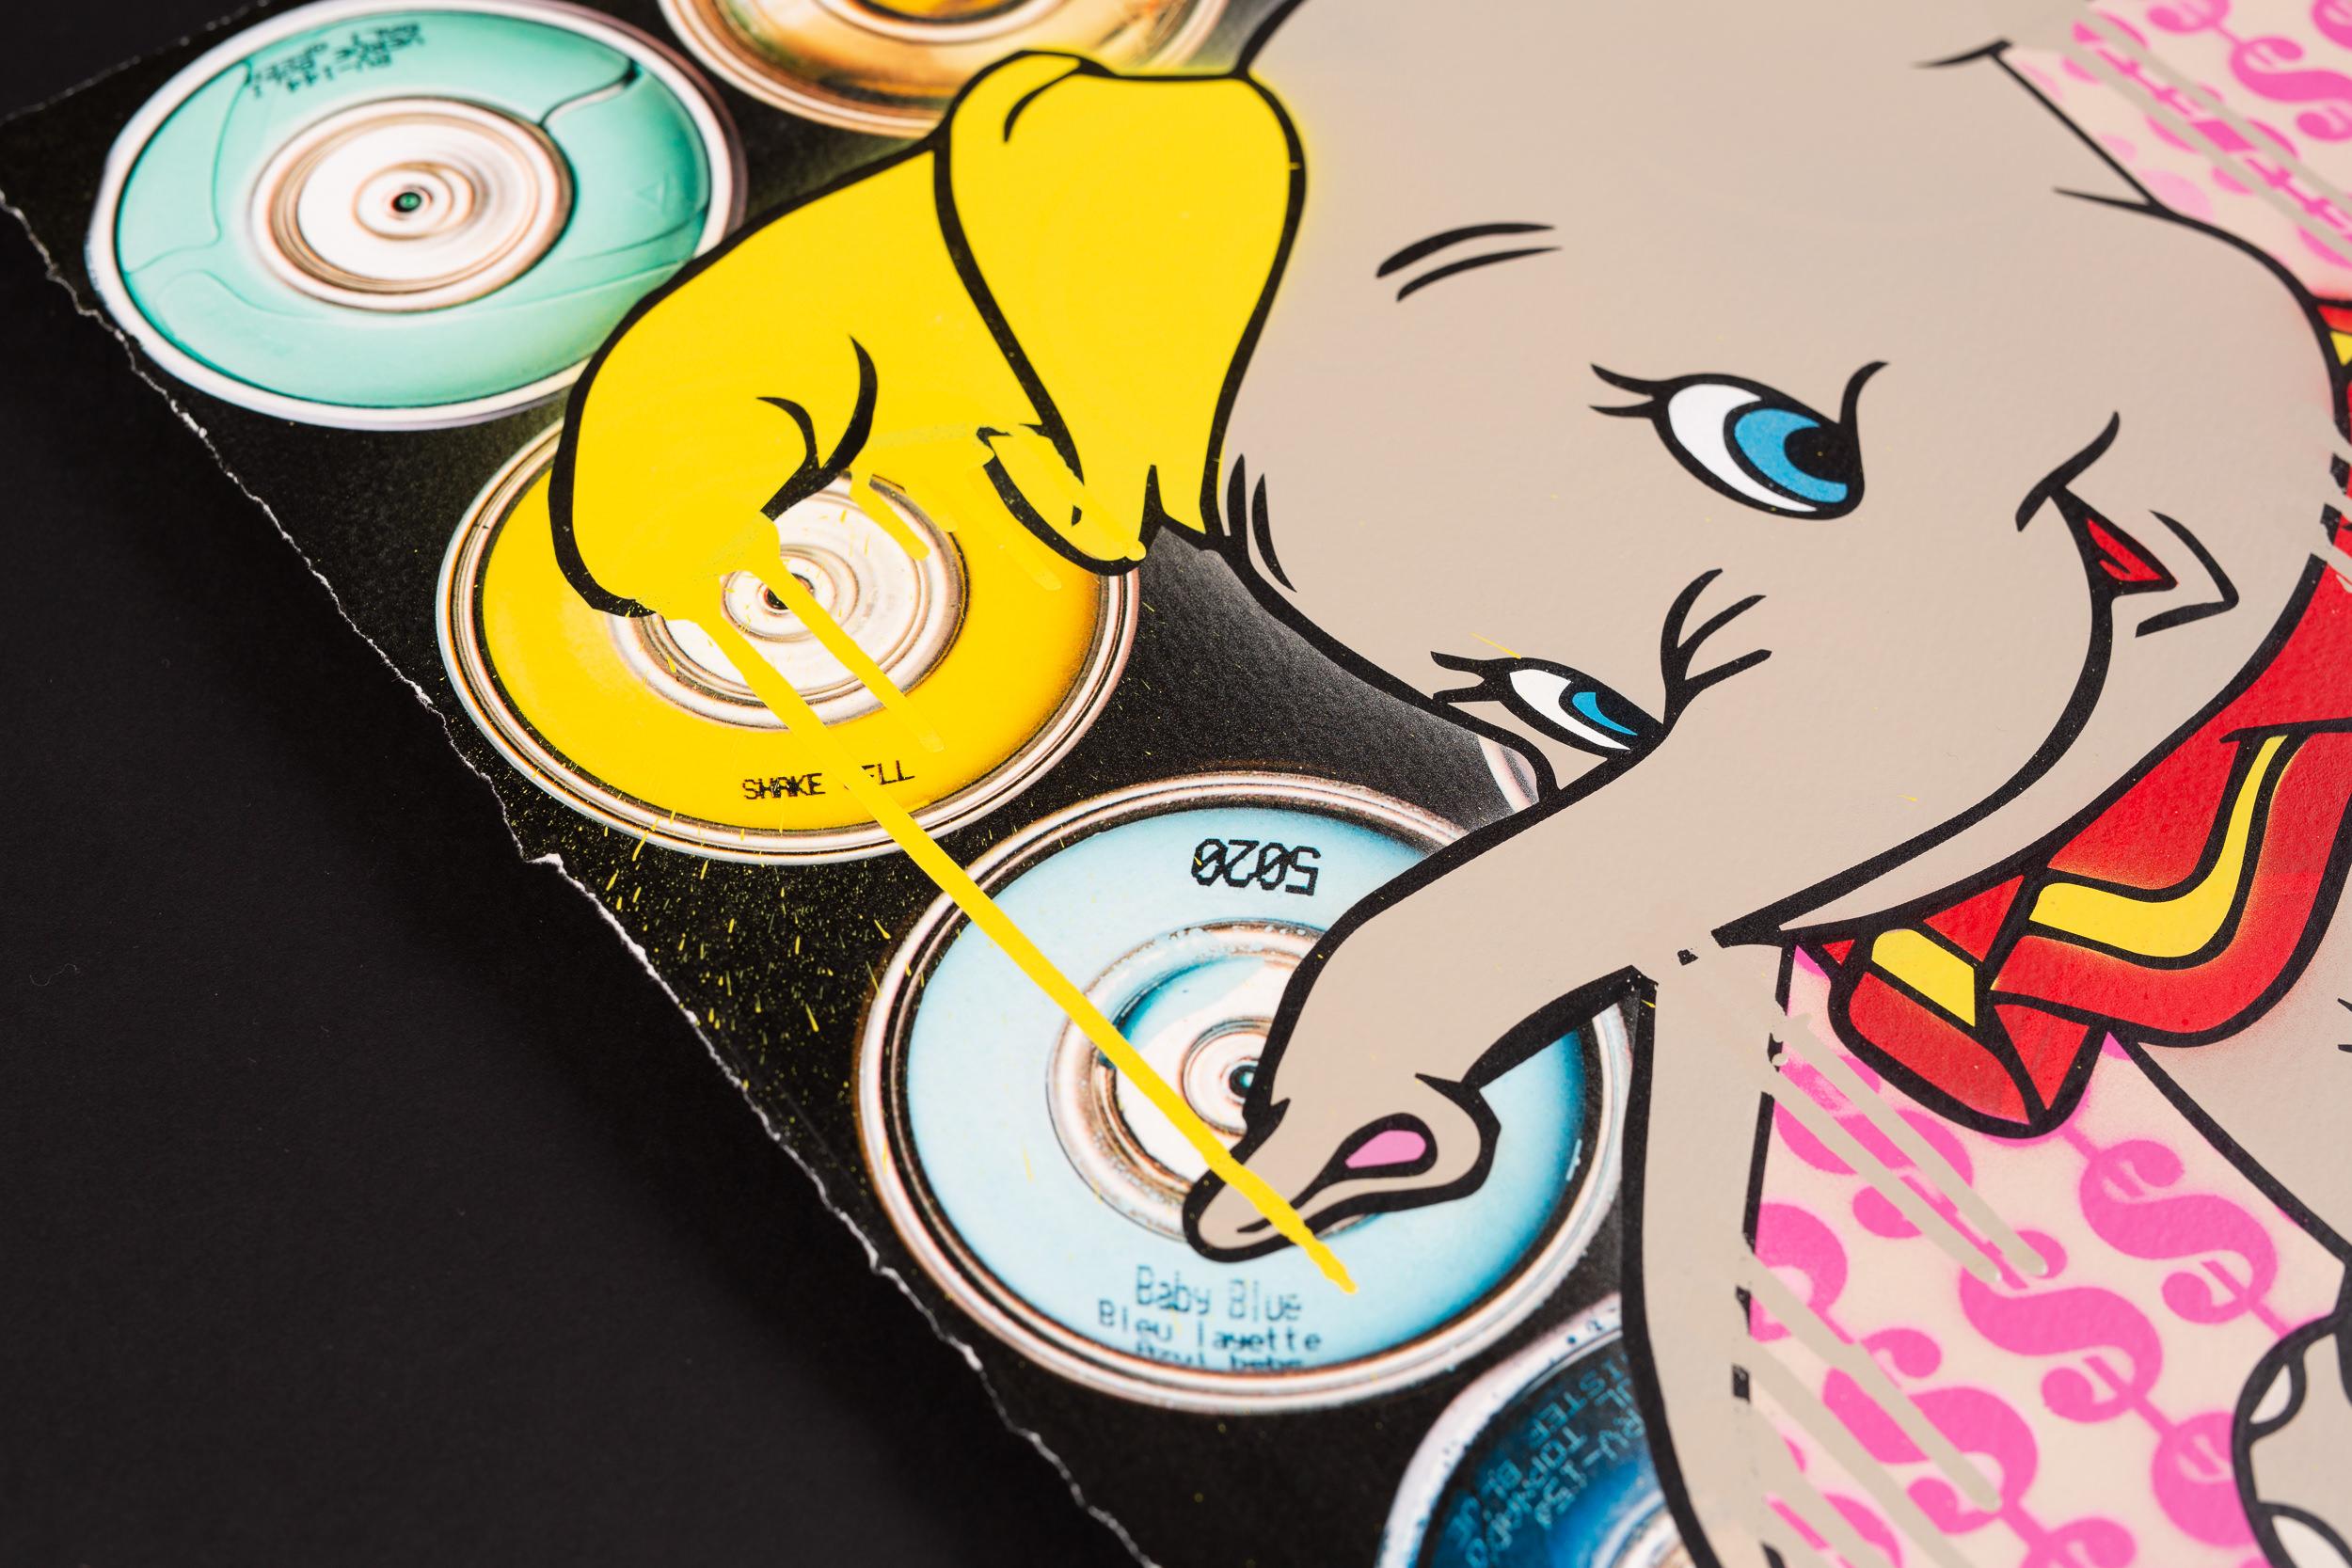 Popaganda-Cans-Dumbo-Detail-04.jpg